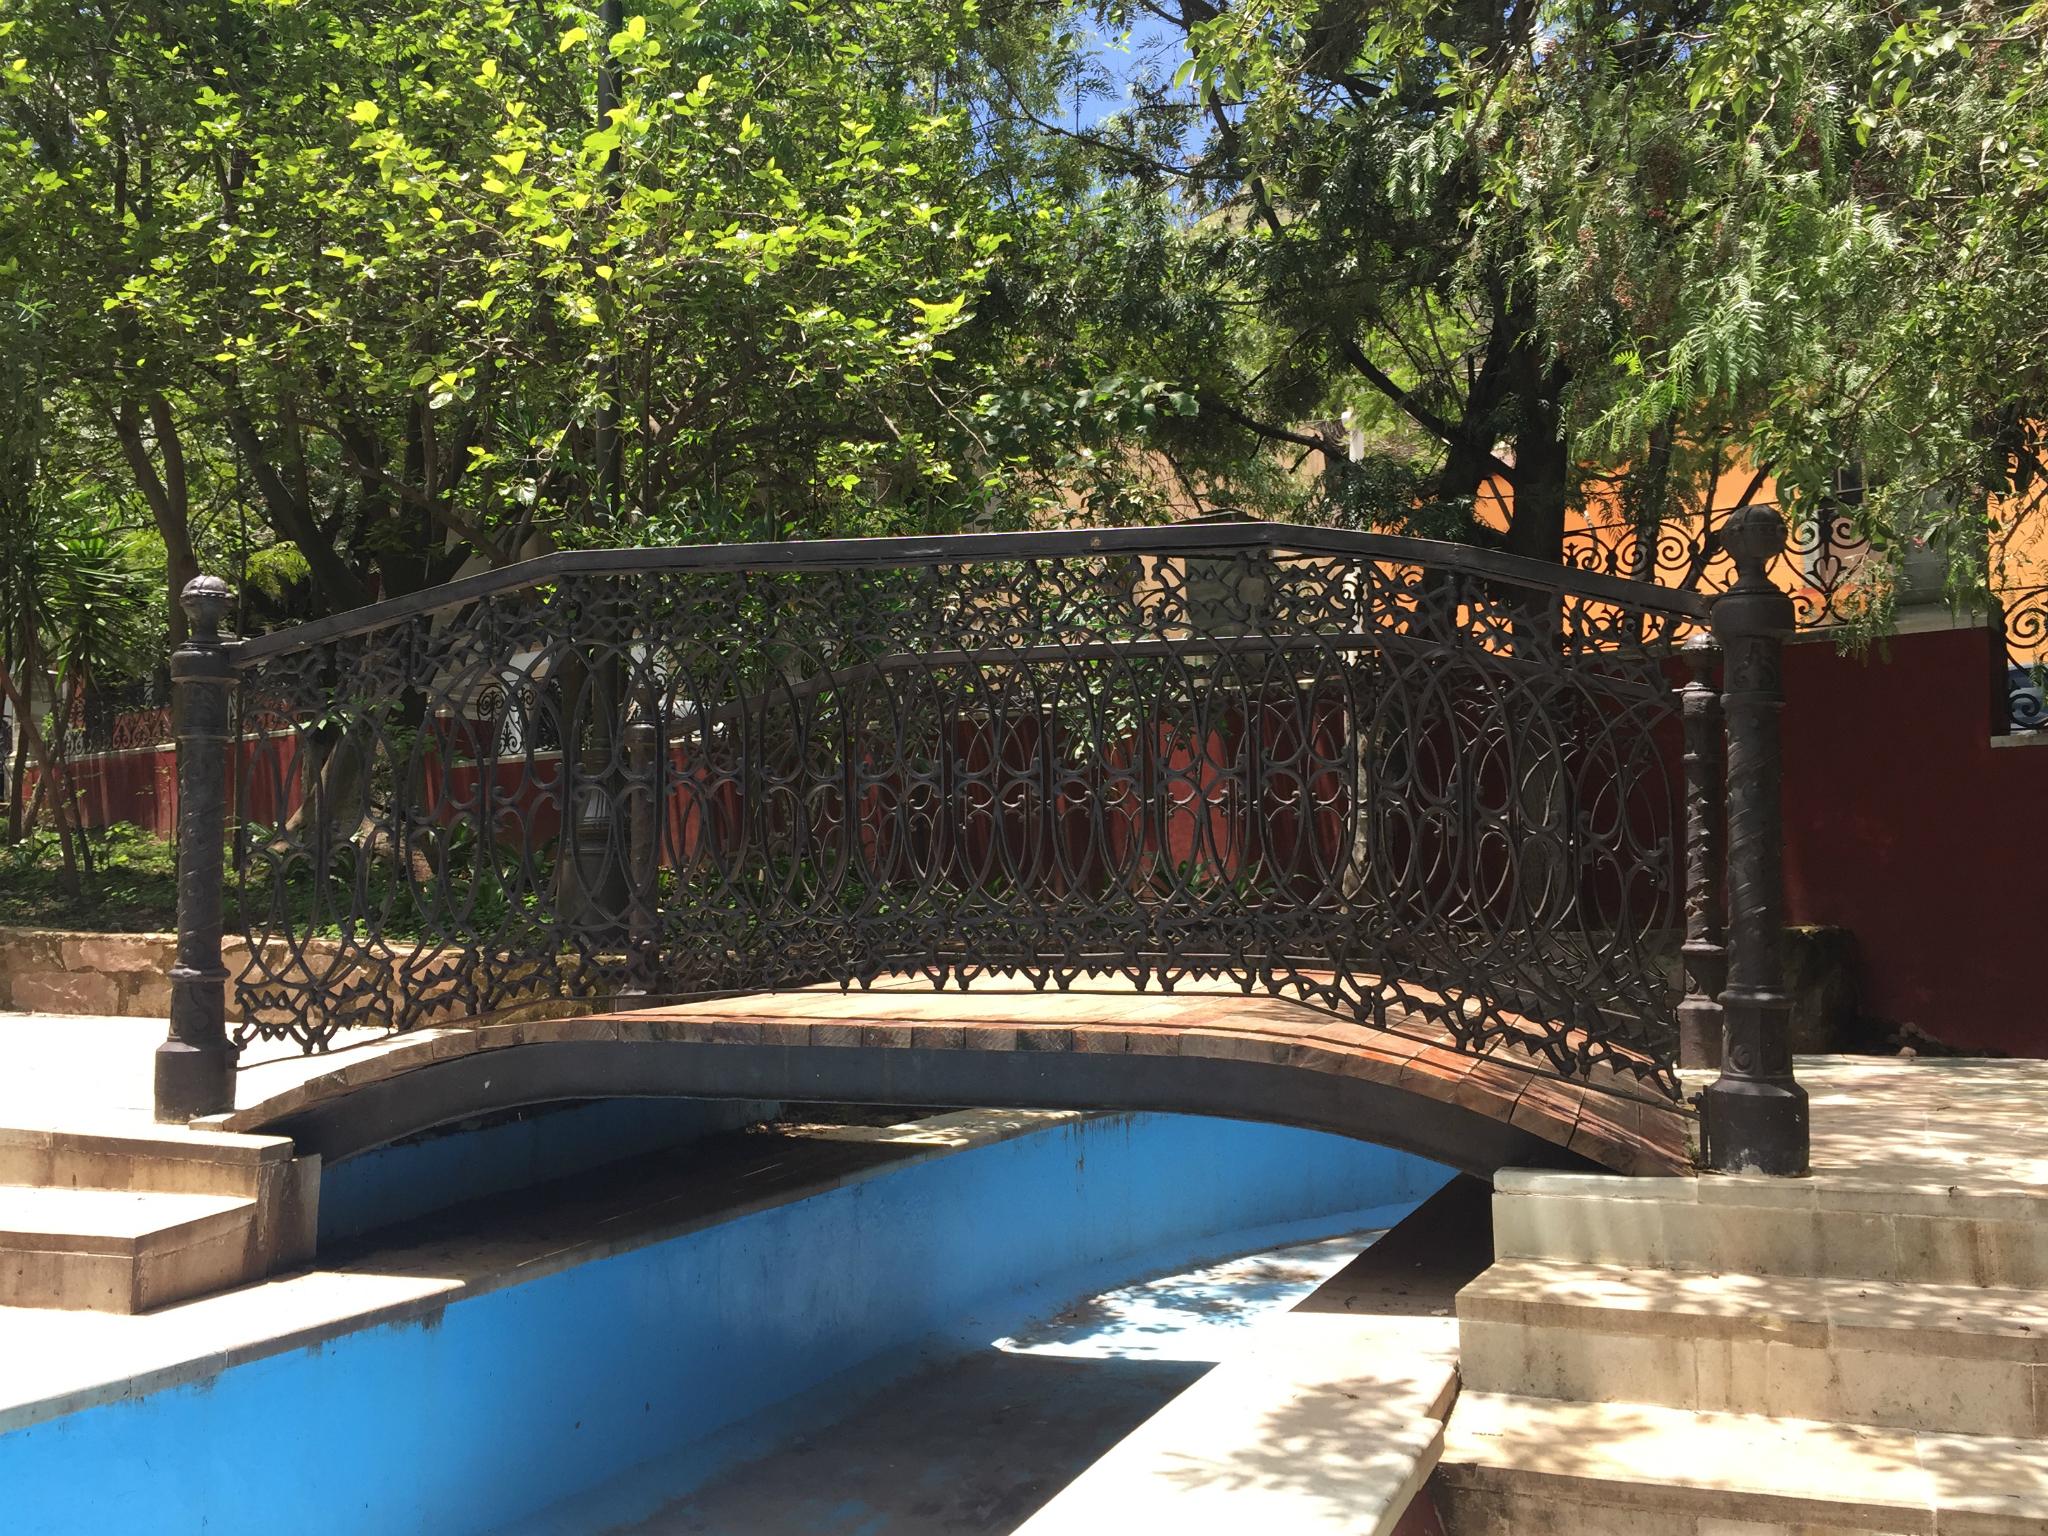 Parque Florencio Antillón